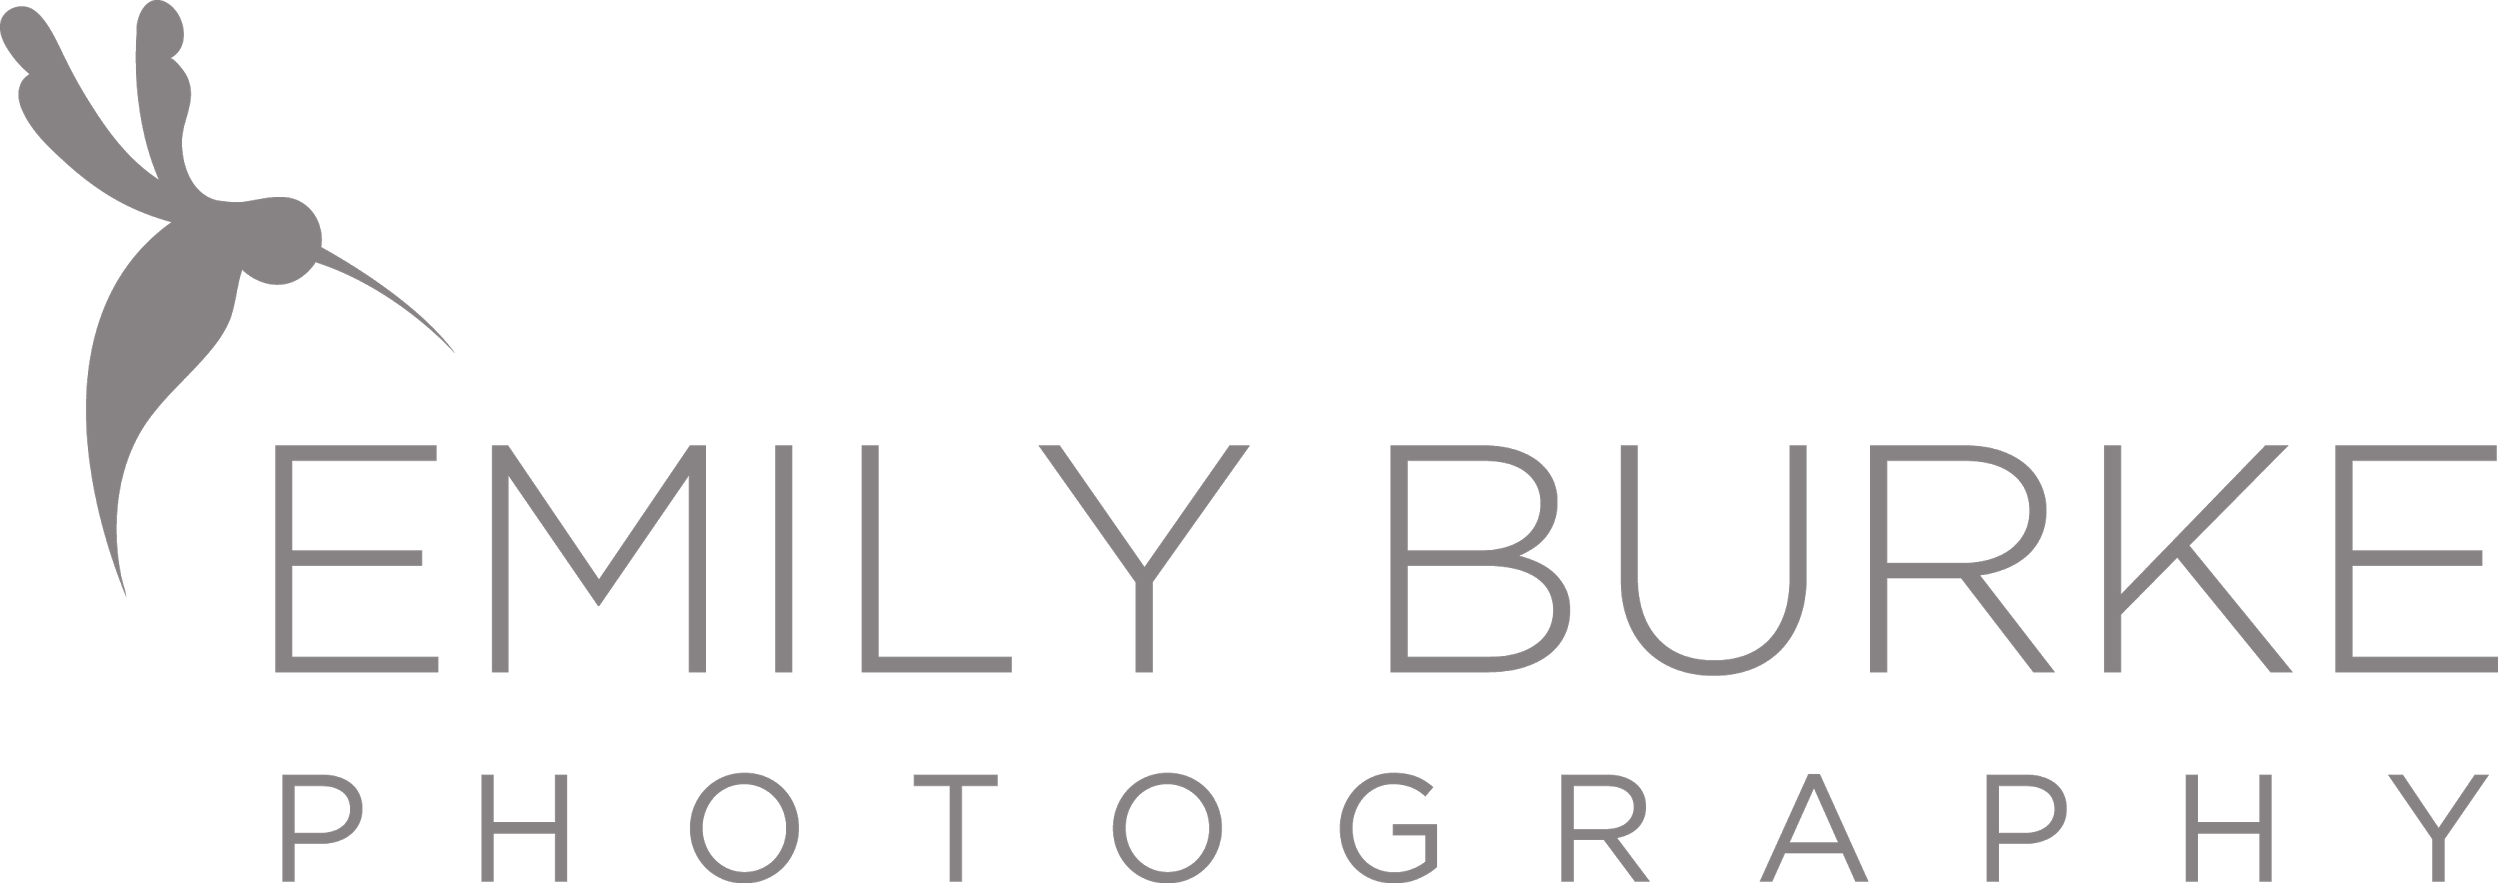 Emily Burke logo.png